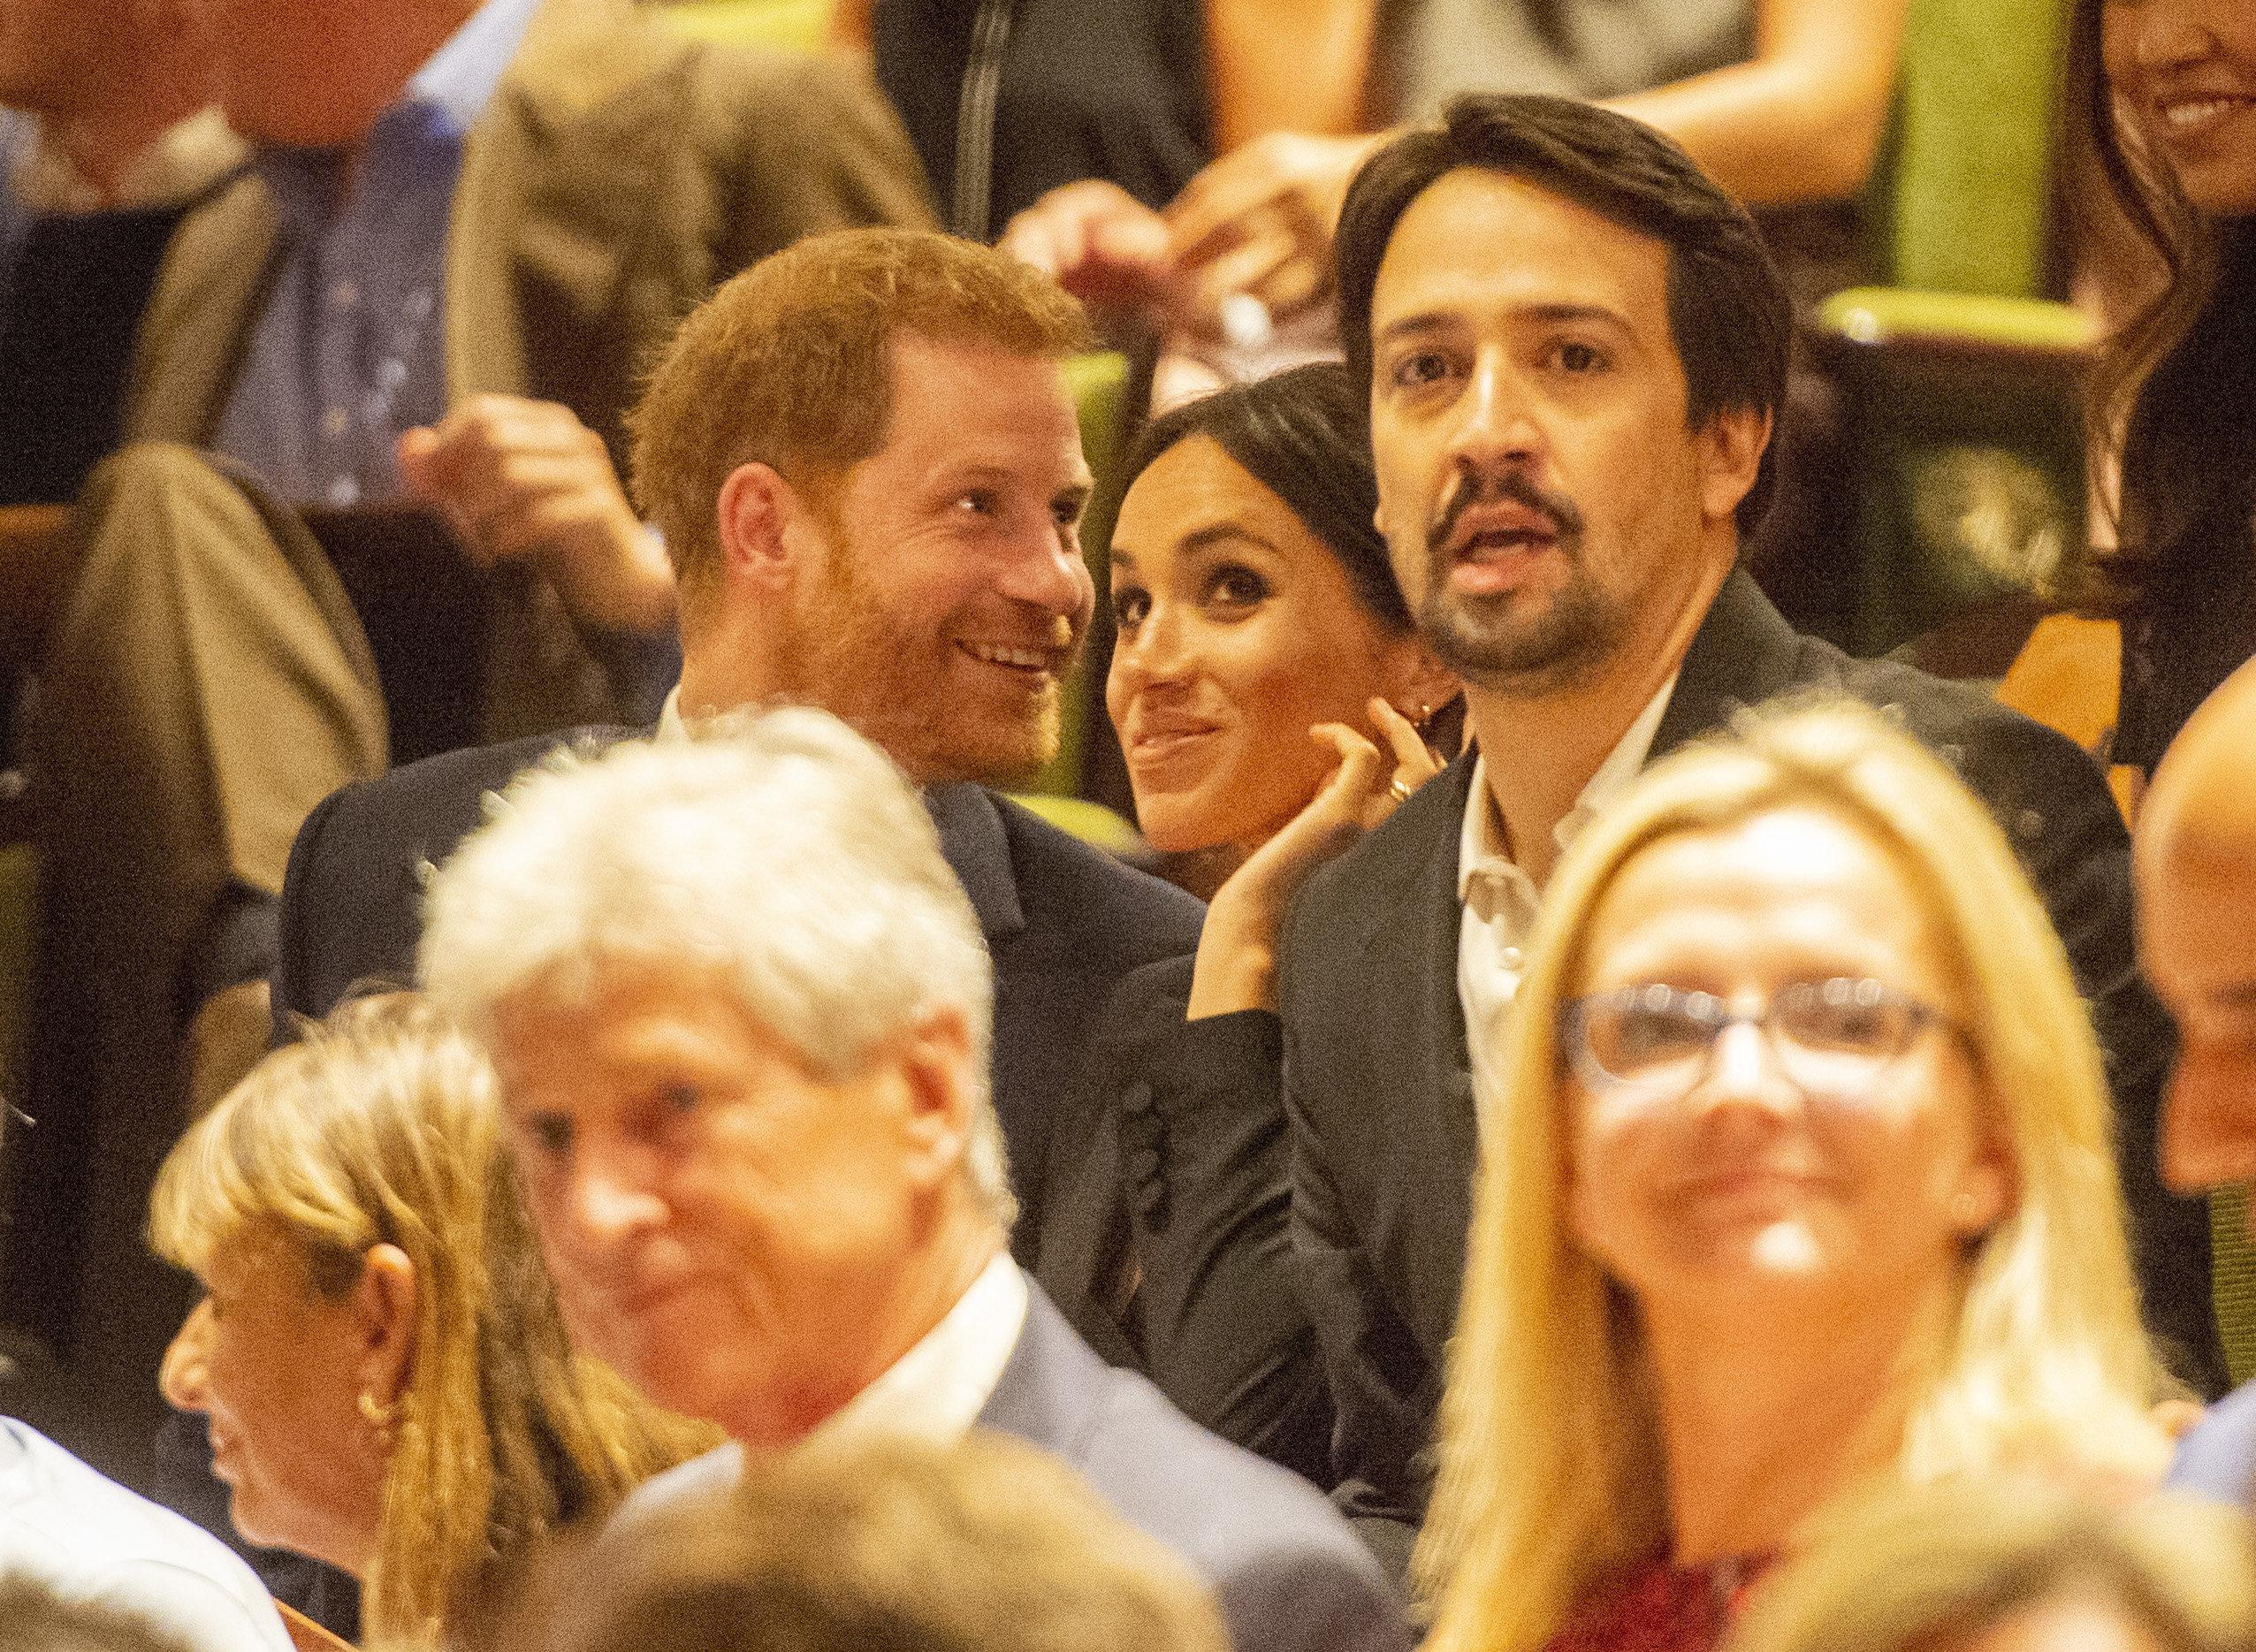 Royals: Herzogin Meghan rutscht Kosenamen für Prinz Harry